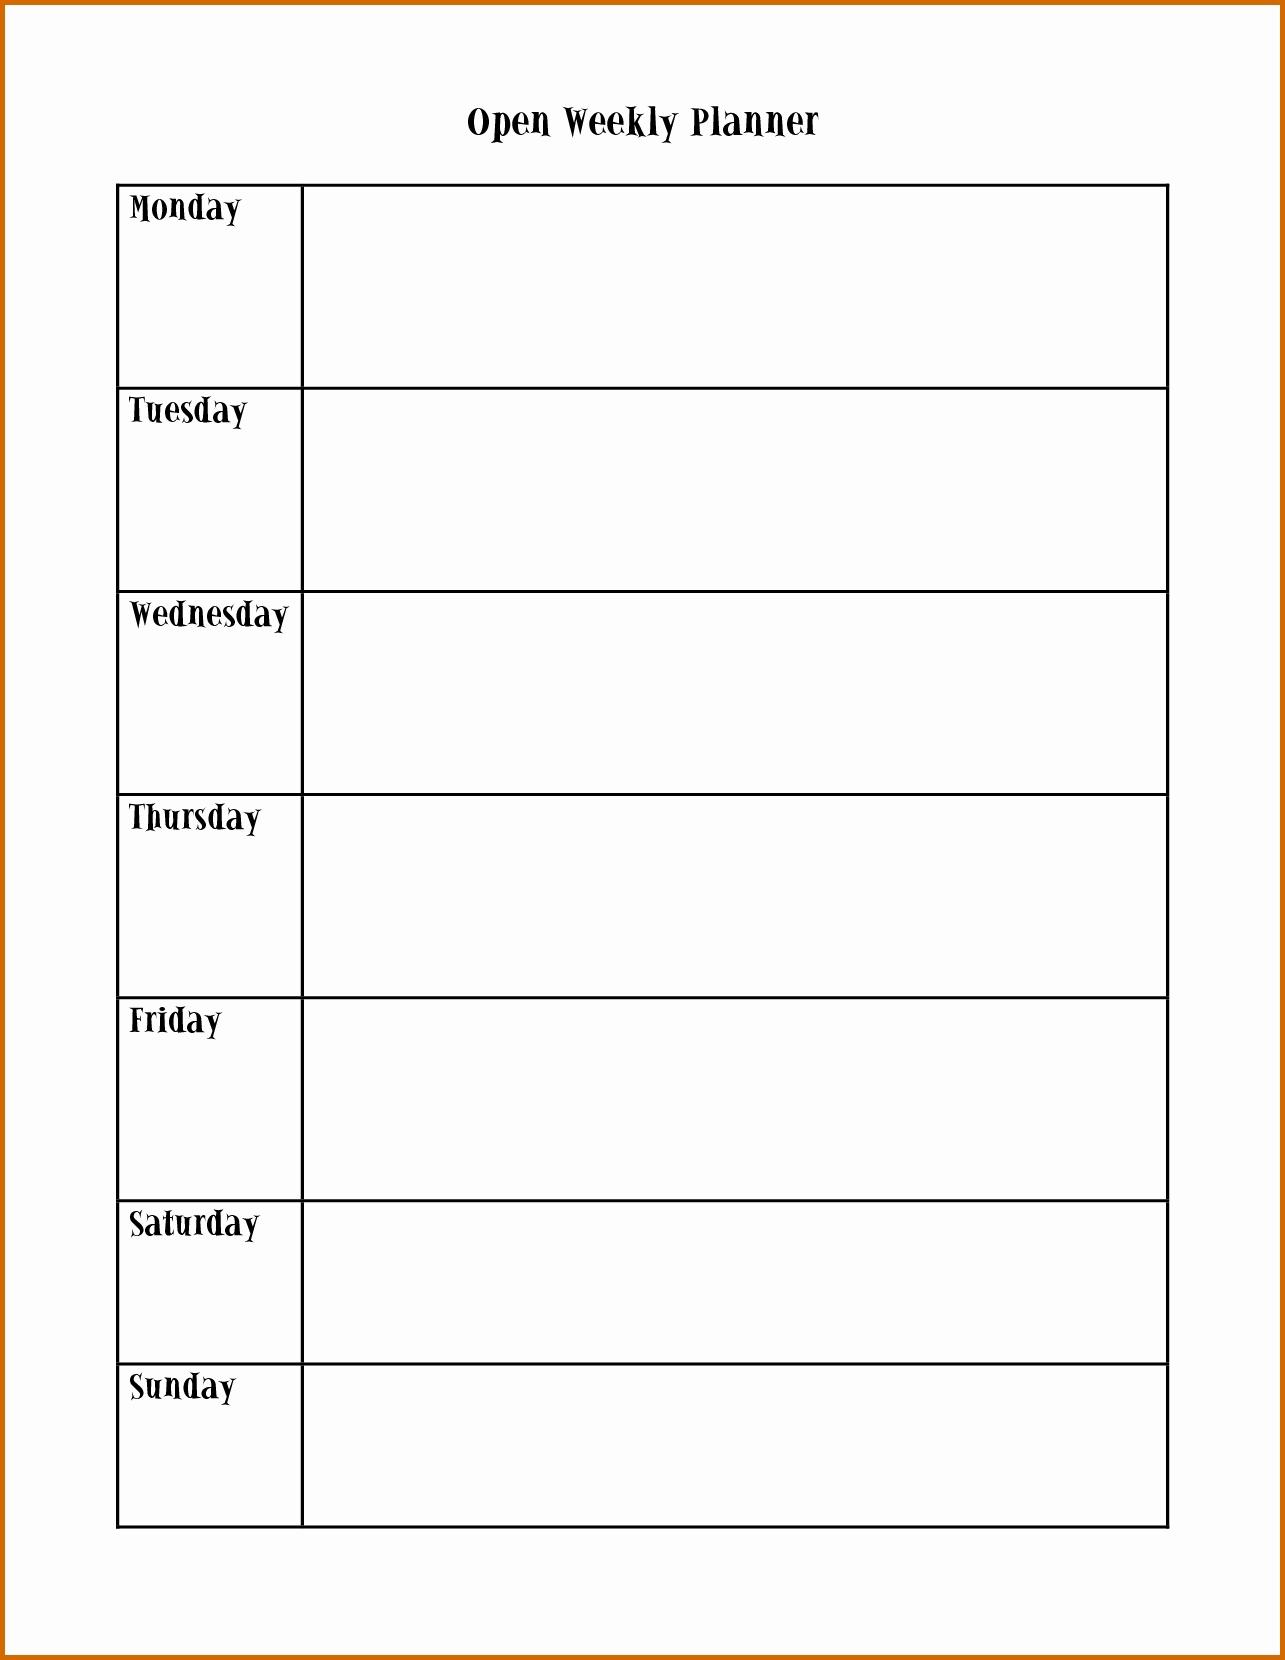 Schedule Plate Monday Through Friday Weekly Calendar Word | Smorad within Monday Thru Friday Calendar Printable